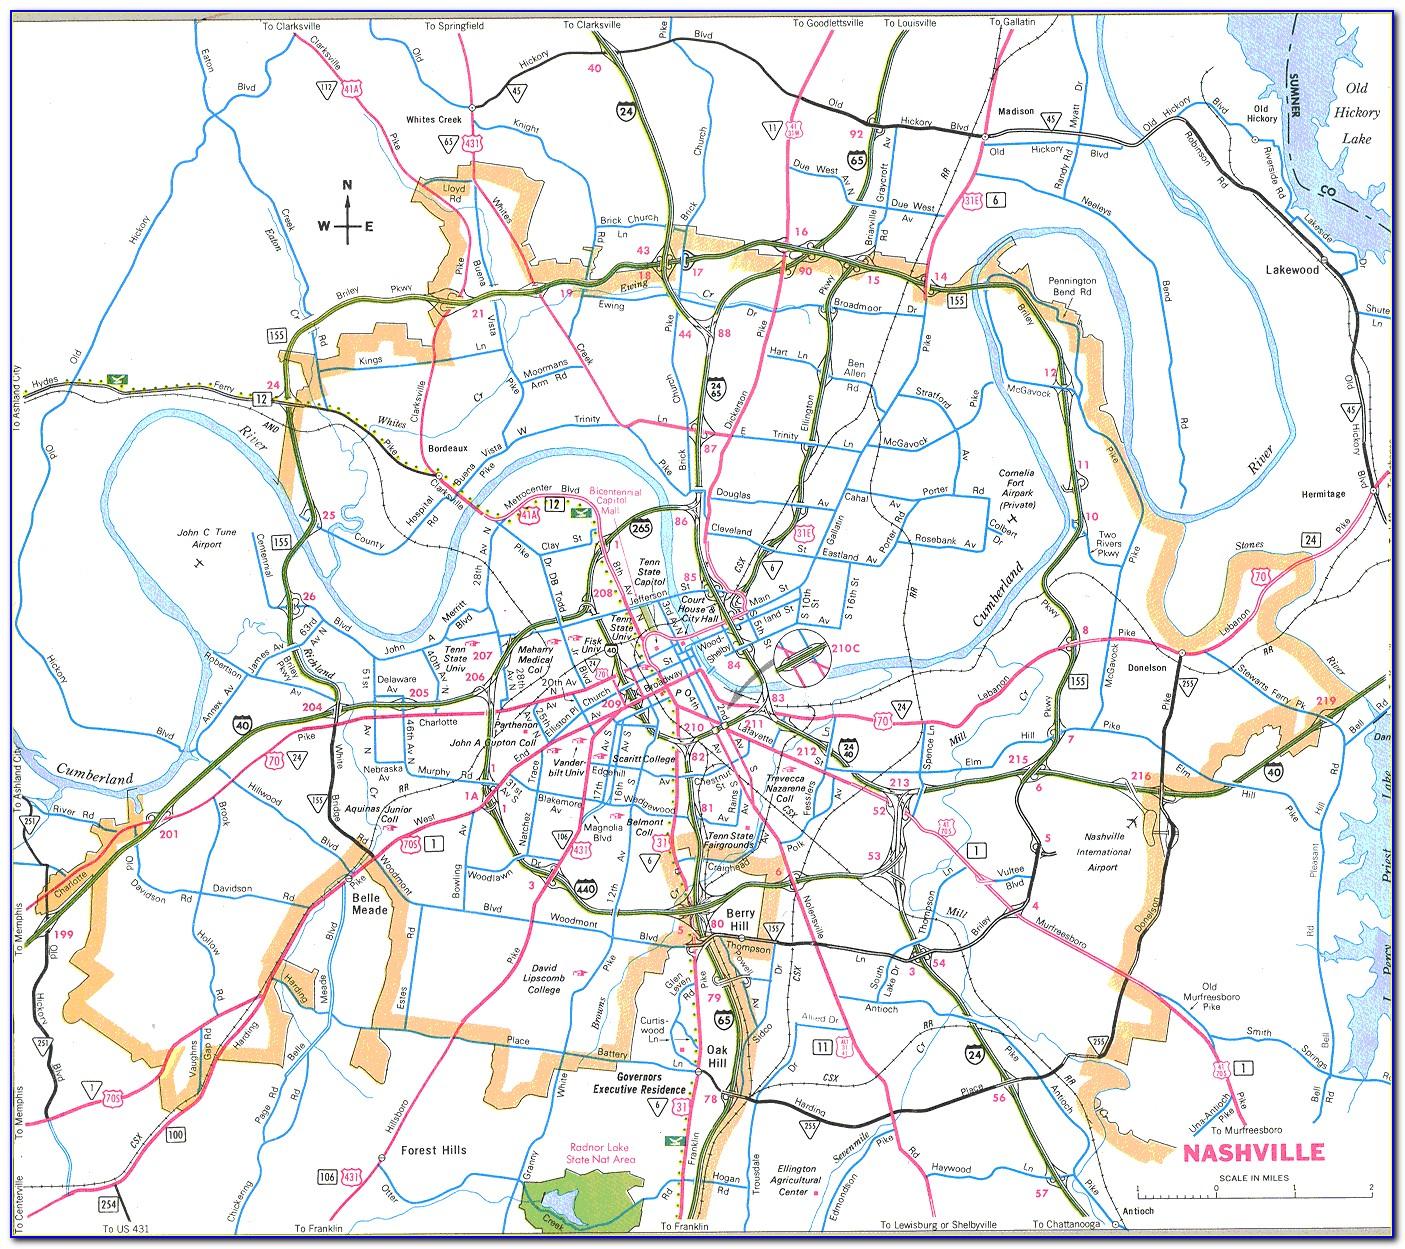 Maps Of Nashville Tn And Surrounding Area